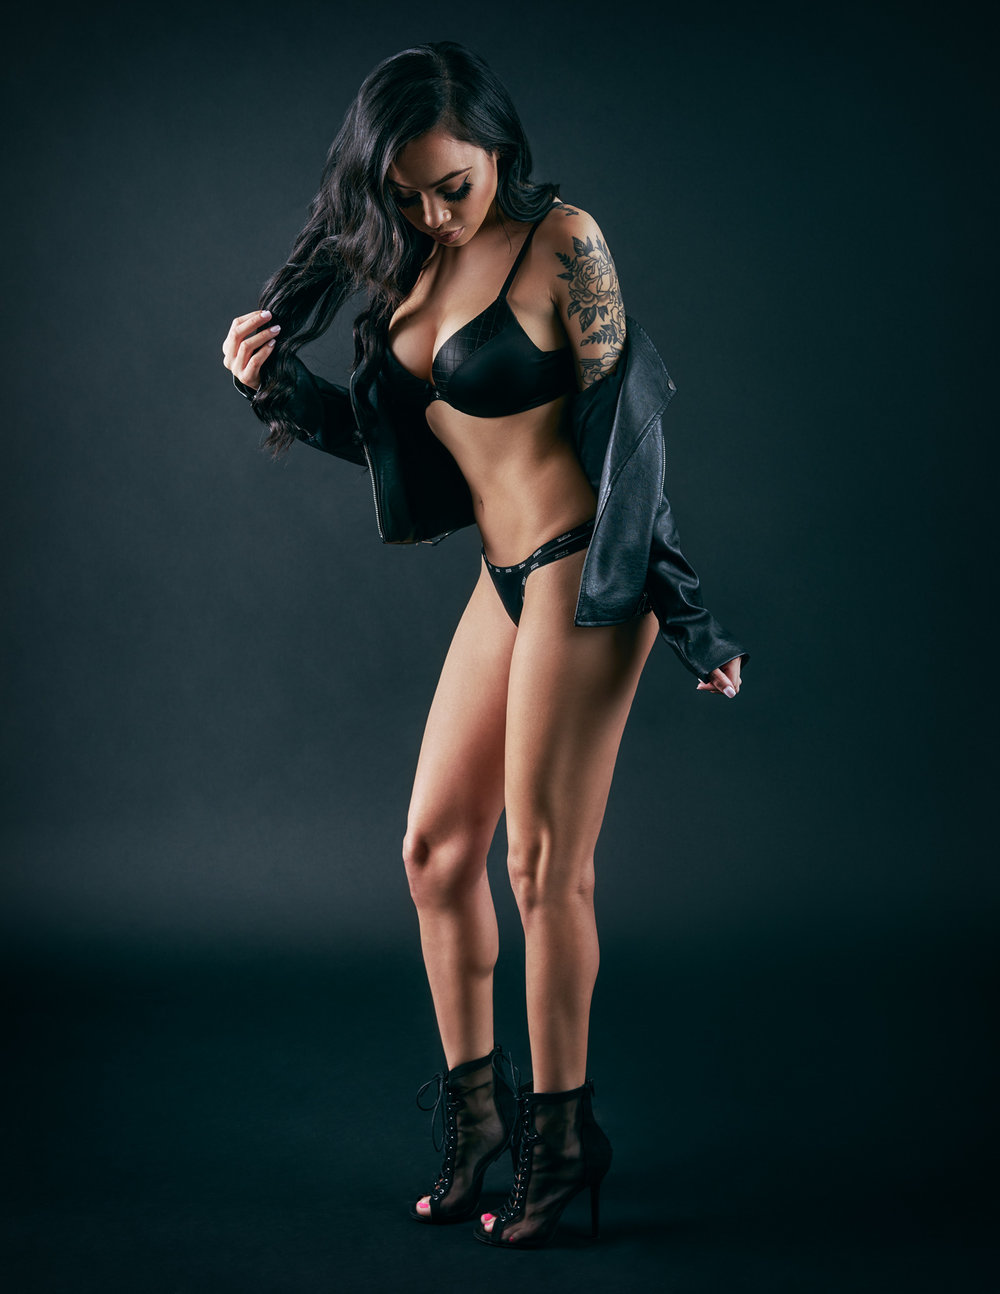 Alexxa by Arizona Fashion Photographer Chad Weed